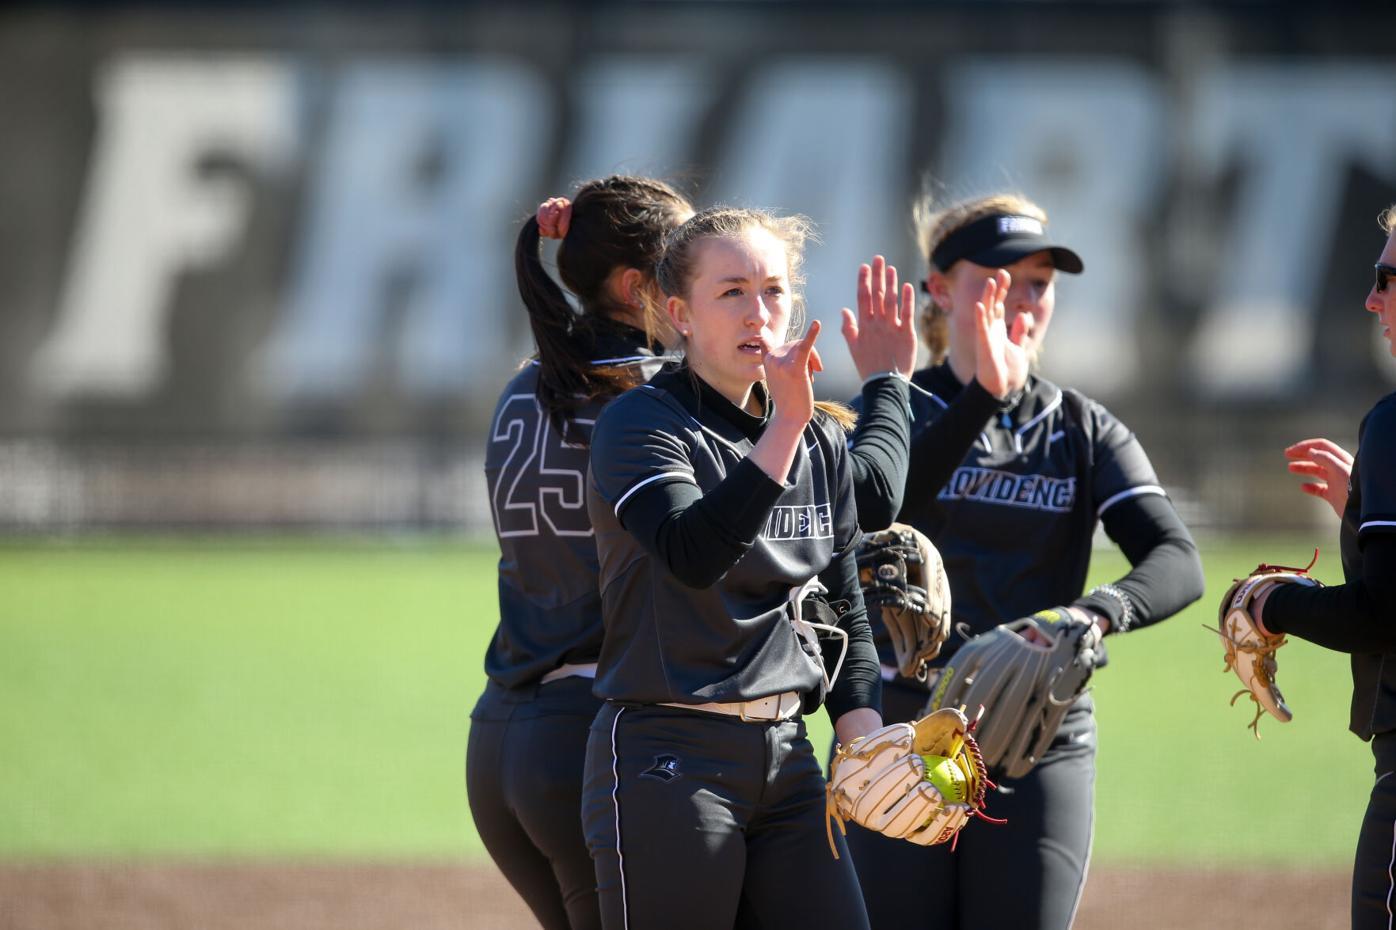 Julia Murphy signals to teammates